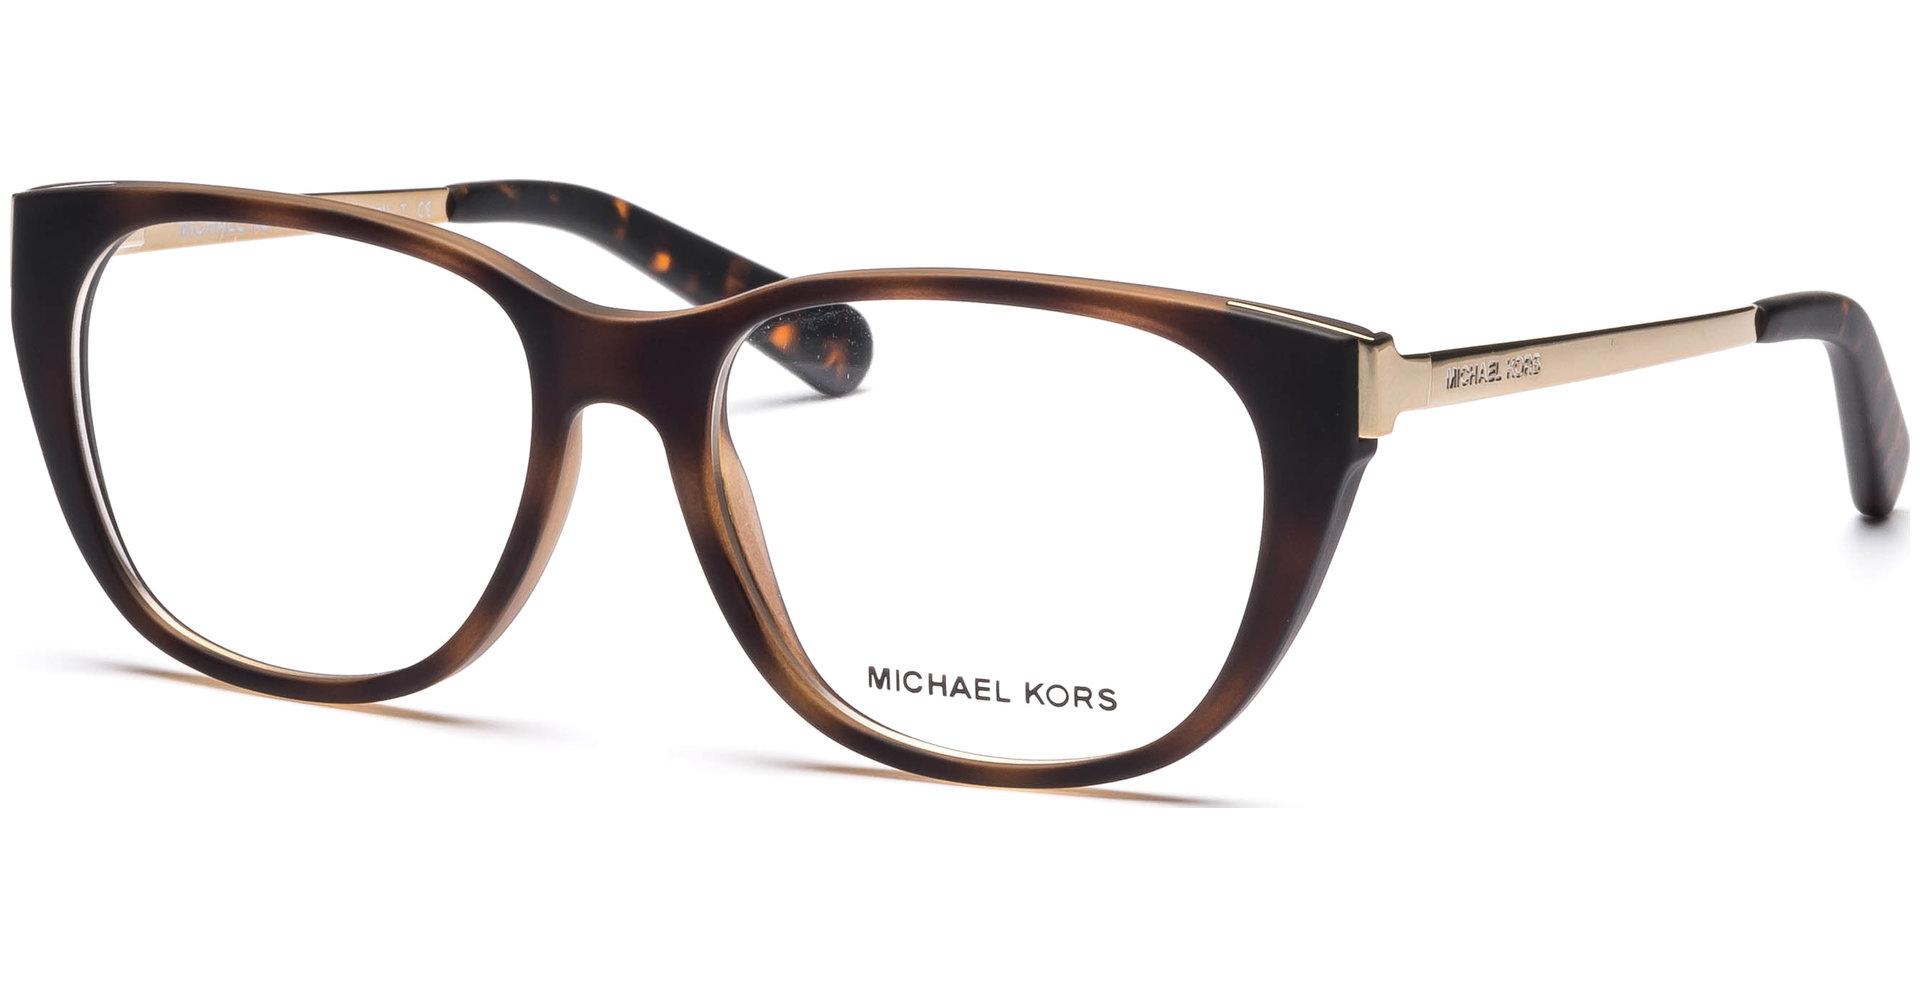 michael kors phuket mk8011 3021 5216 dark tortoise soft. Black Bedroom Furniture Sets. Home Design Ideas